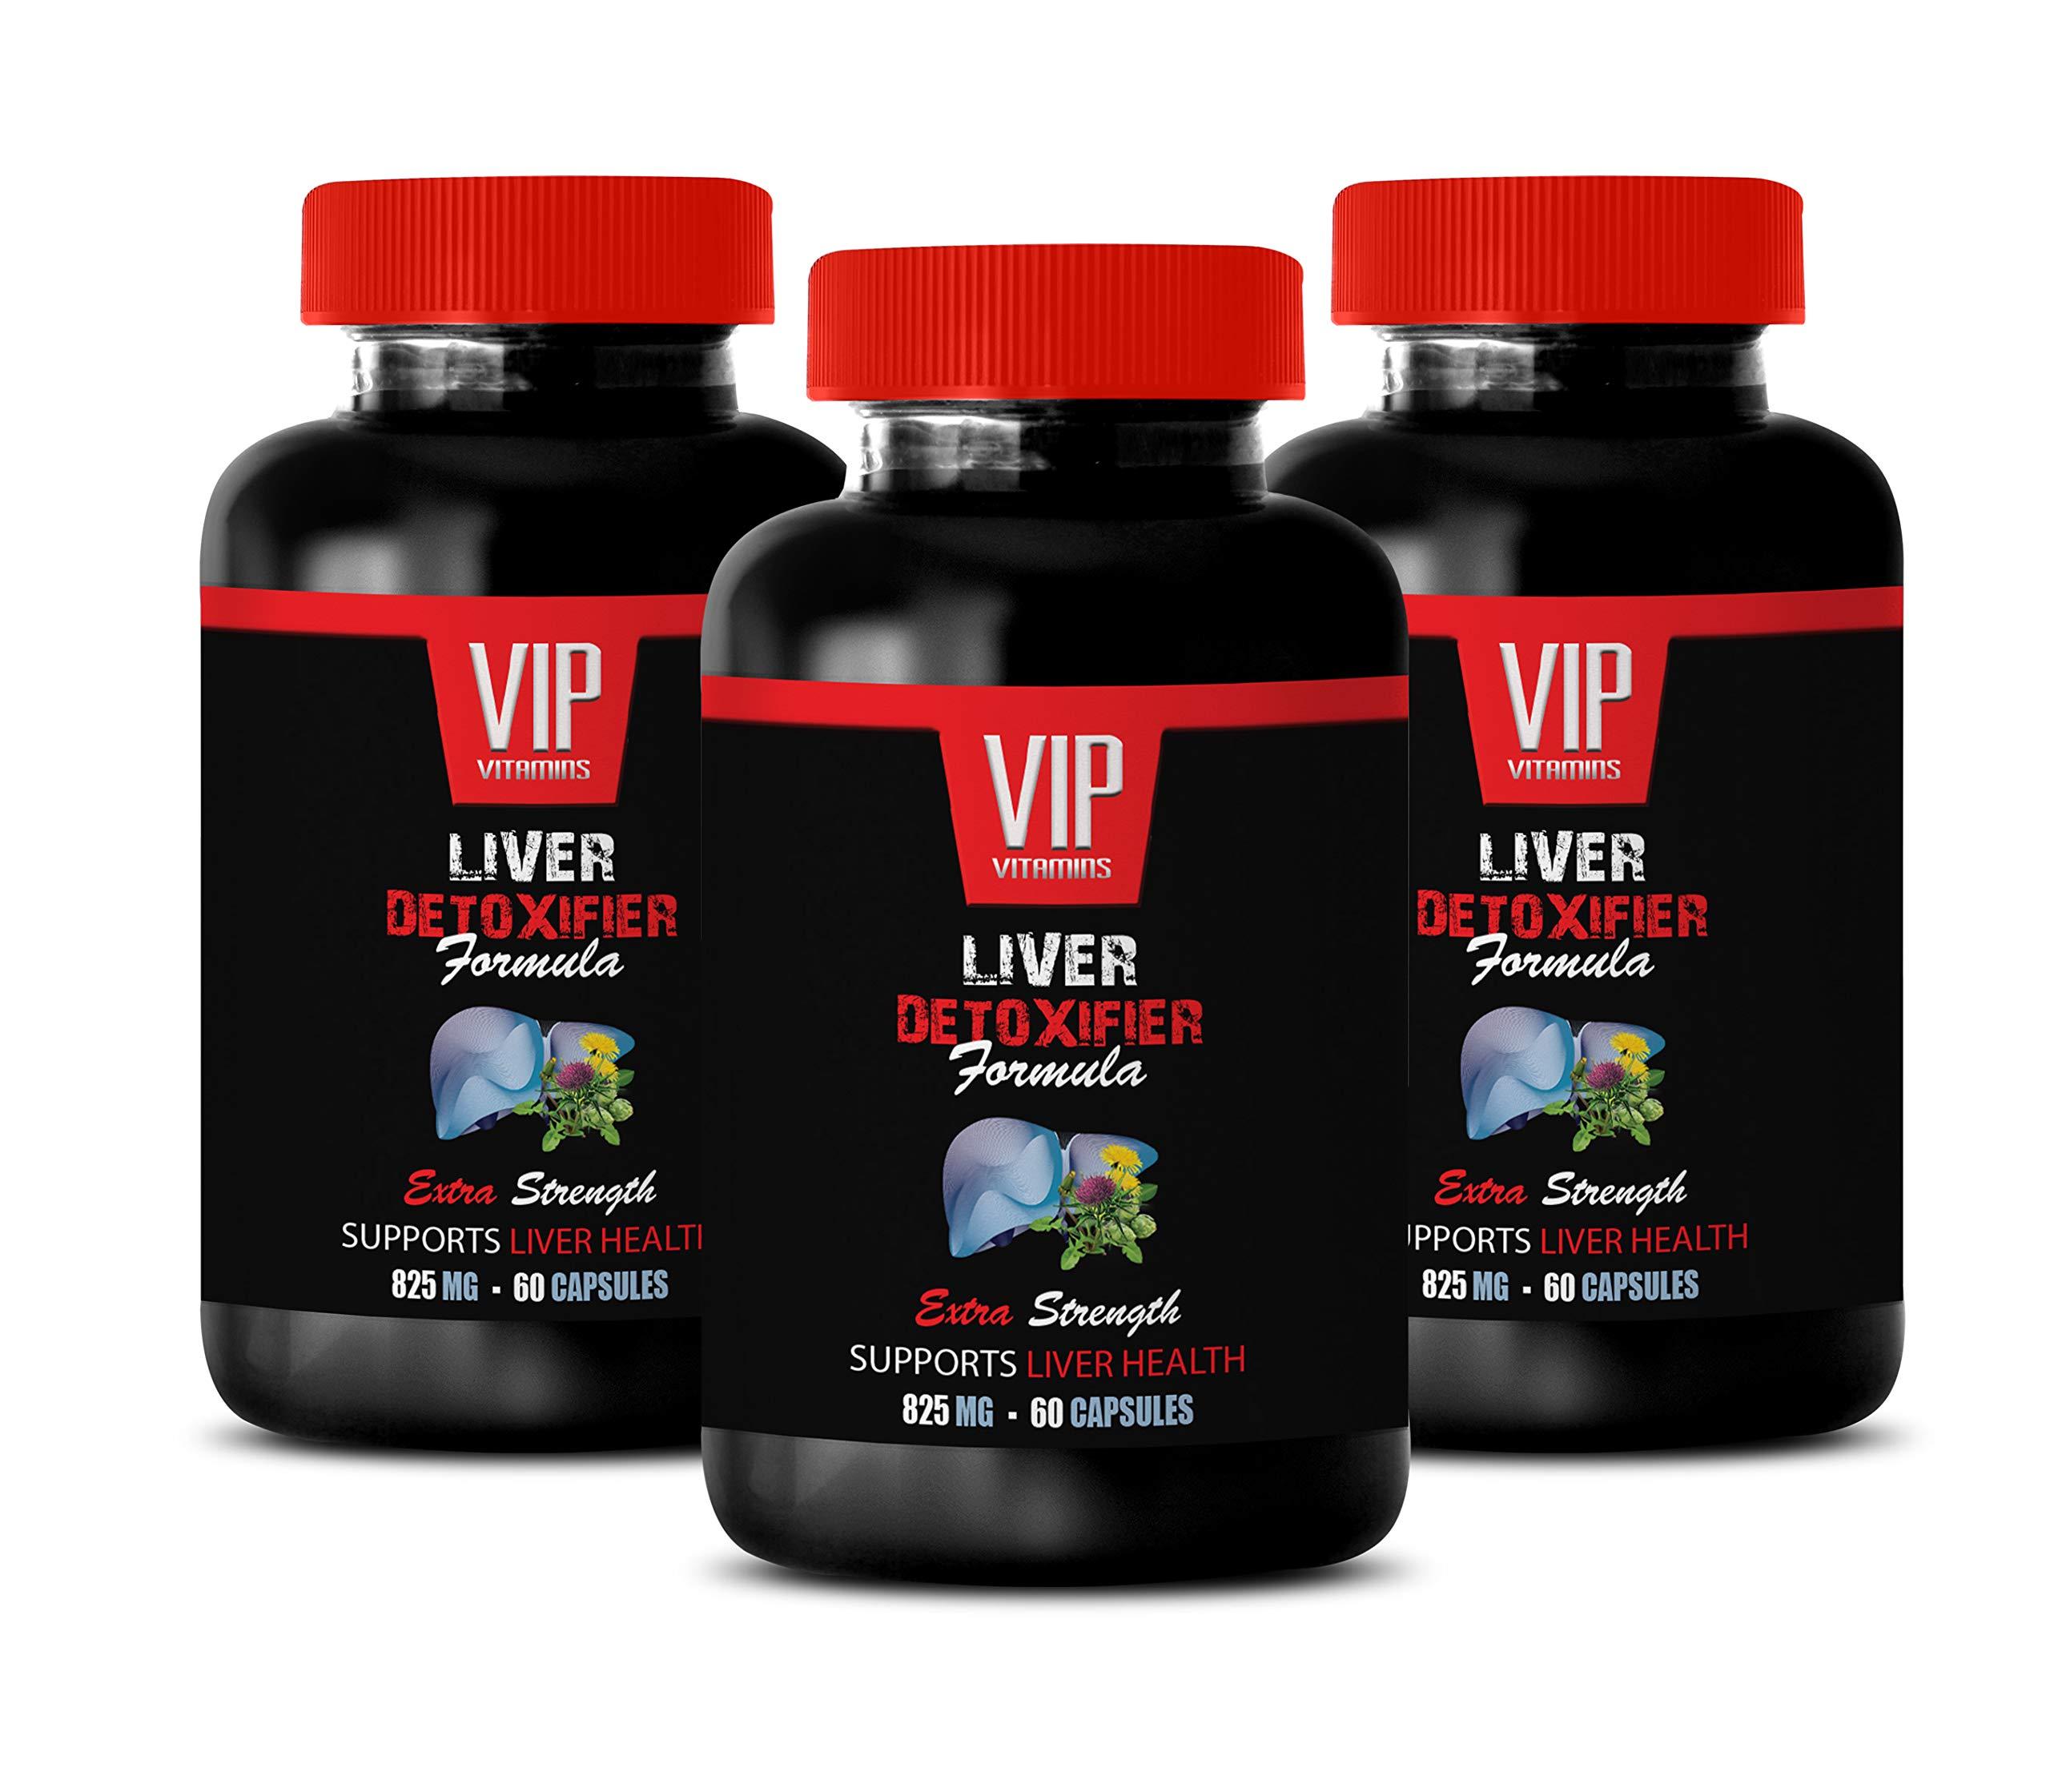 Liver Support Supplement - Liver DETOXIFIER Formula - Supports Liver Health - protease Enzyme Supplement - 3 Bottles 180 Capsules